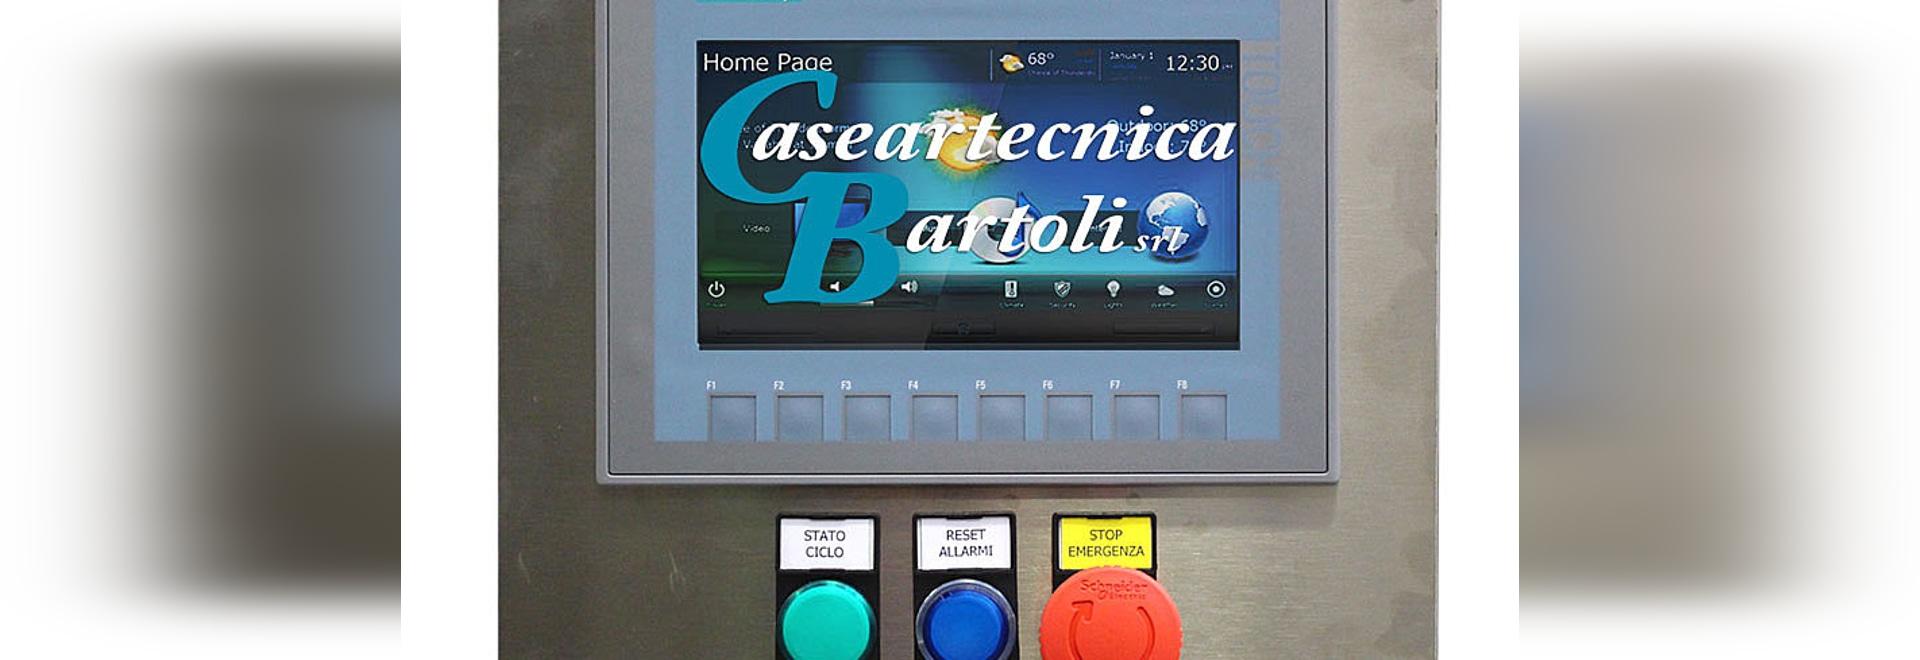 Caseartecnica Bartoli and the new Widescreen control panels.